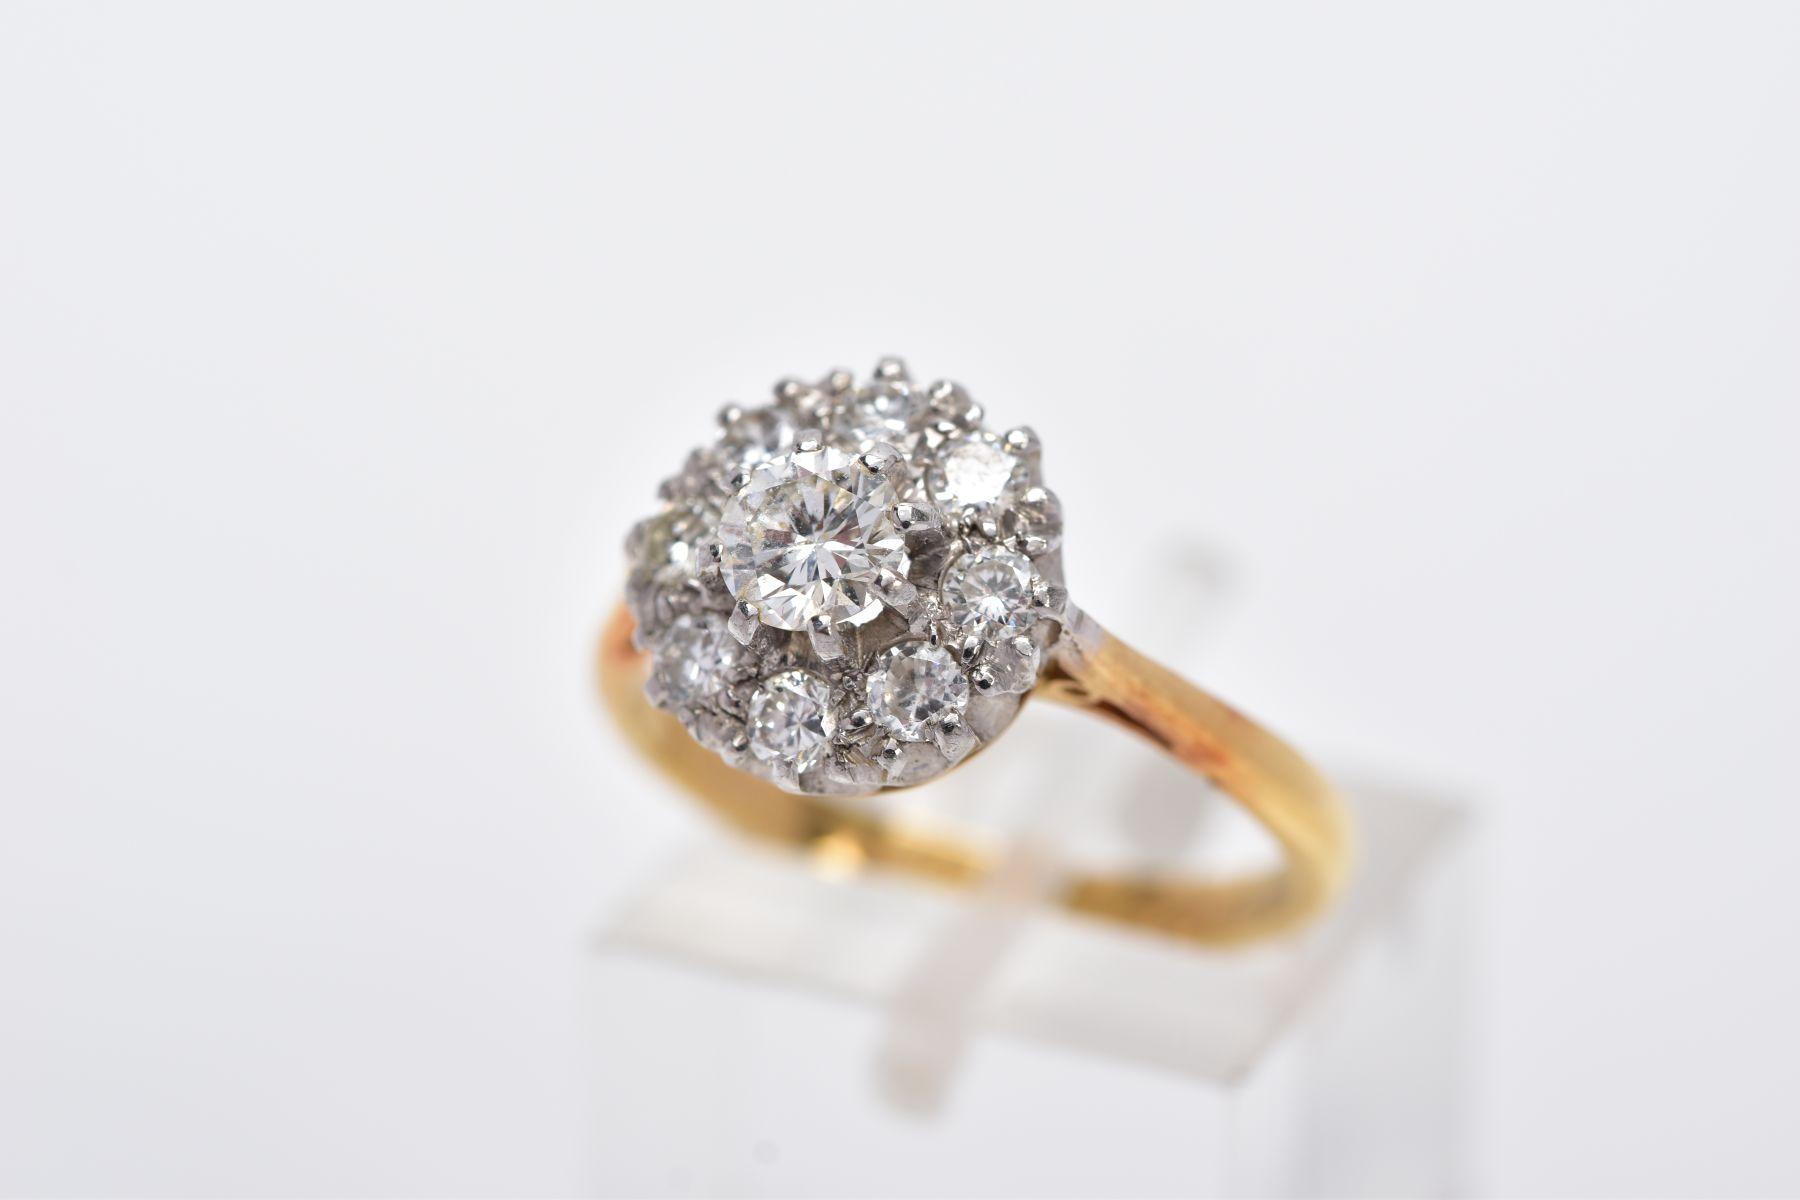 A LATE 20TH CENTURY ROUND DIAMOND CLUSTER RING, centring on a modern round brilliant cut diamond,